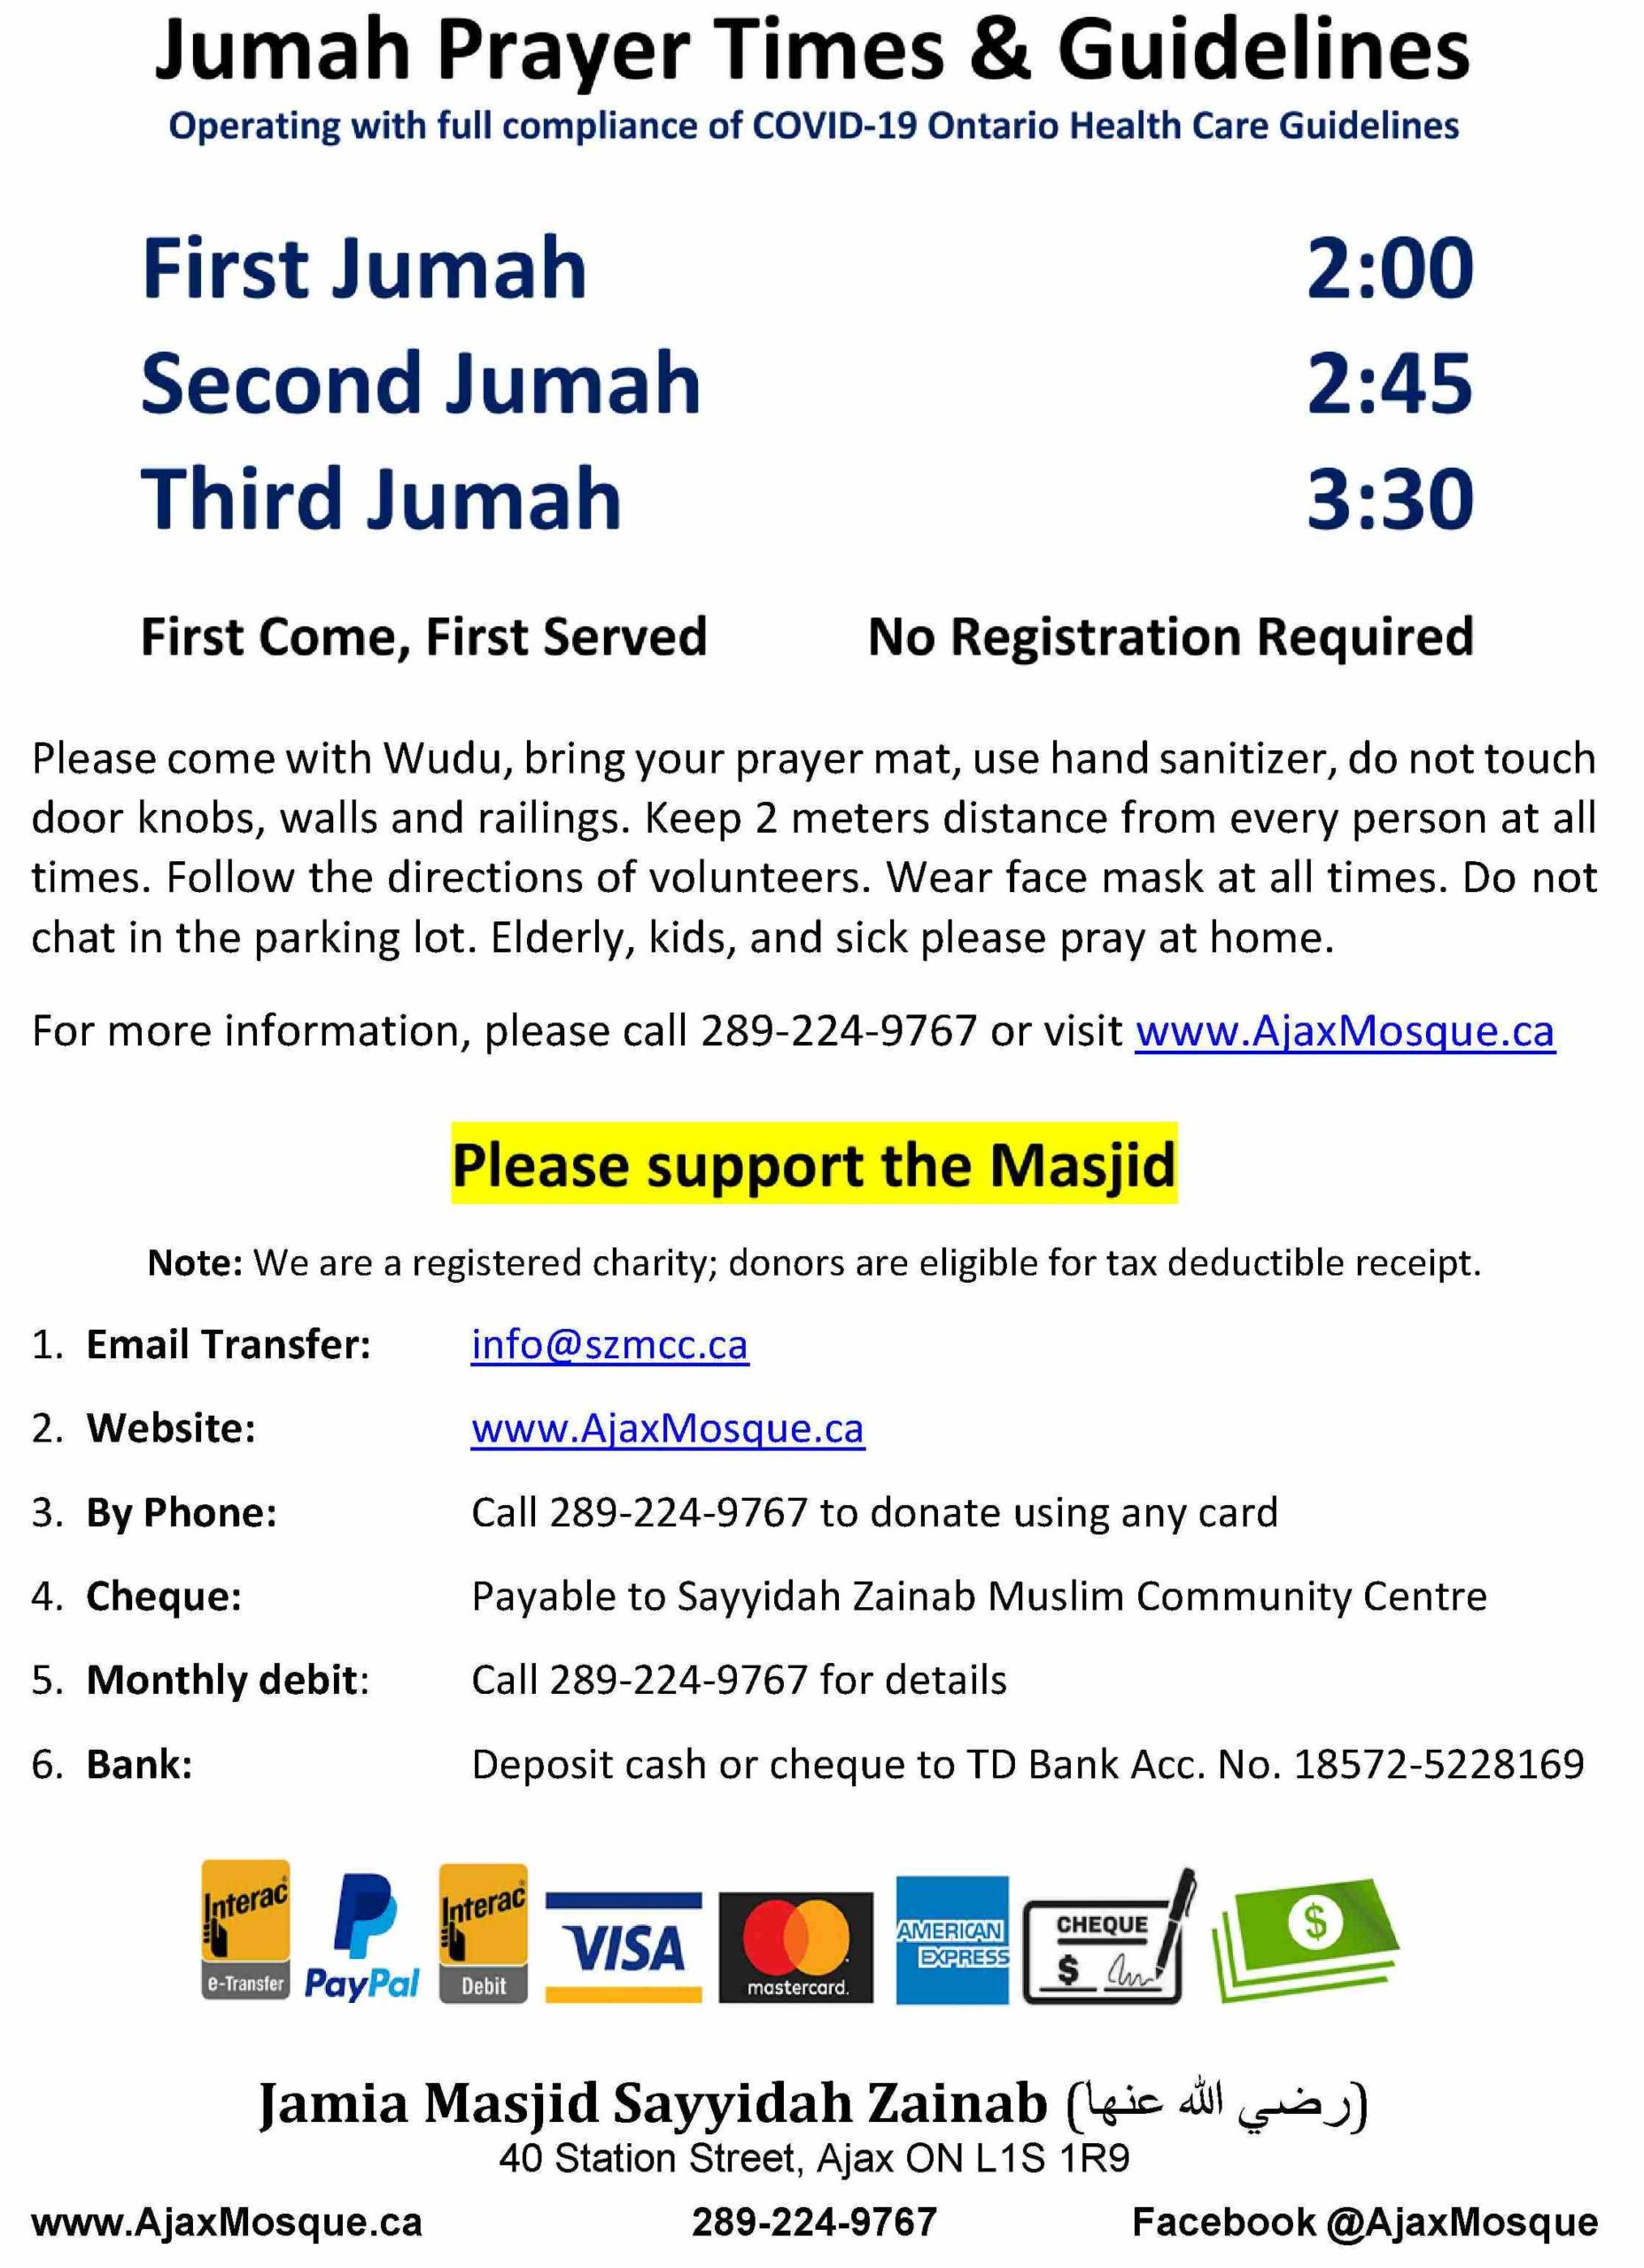 Jumah Prayer Timings